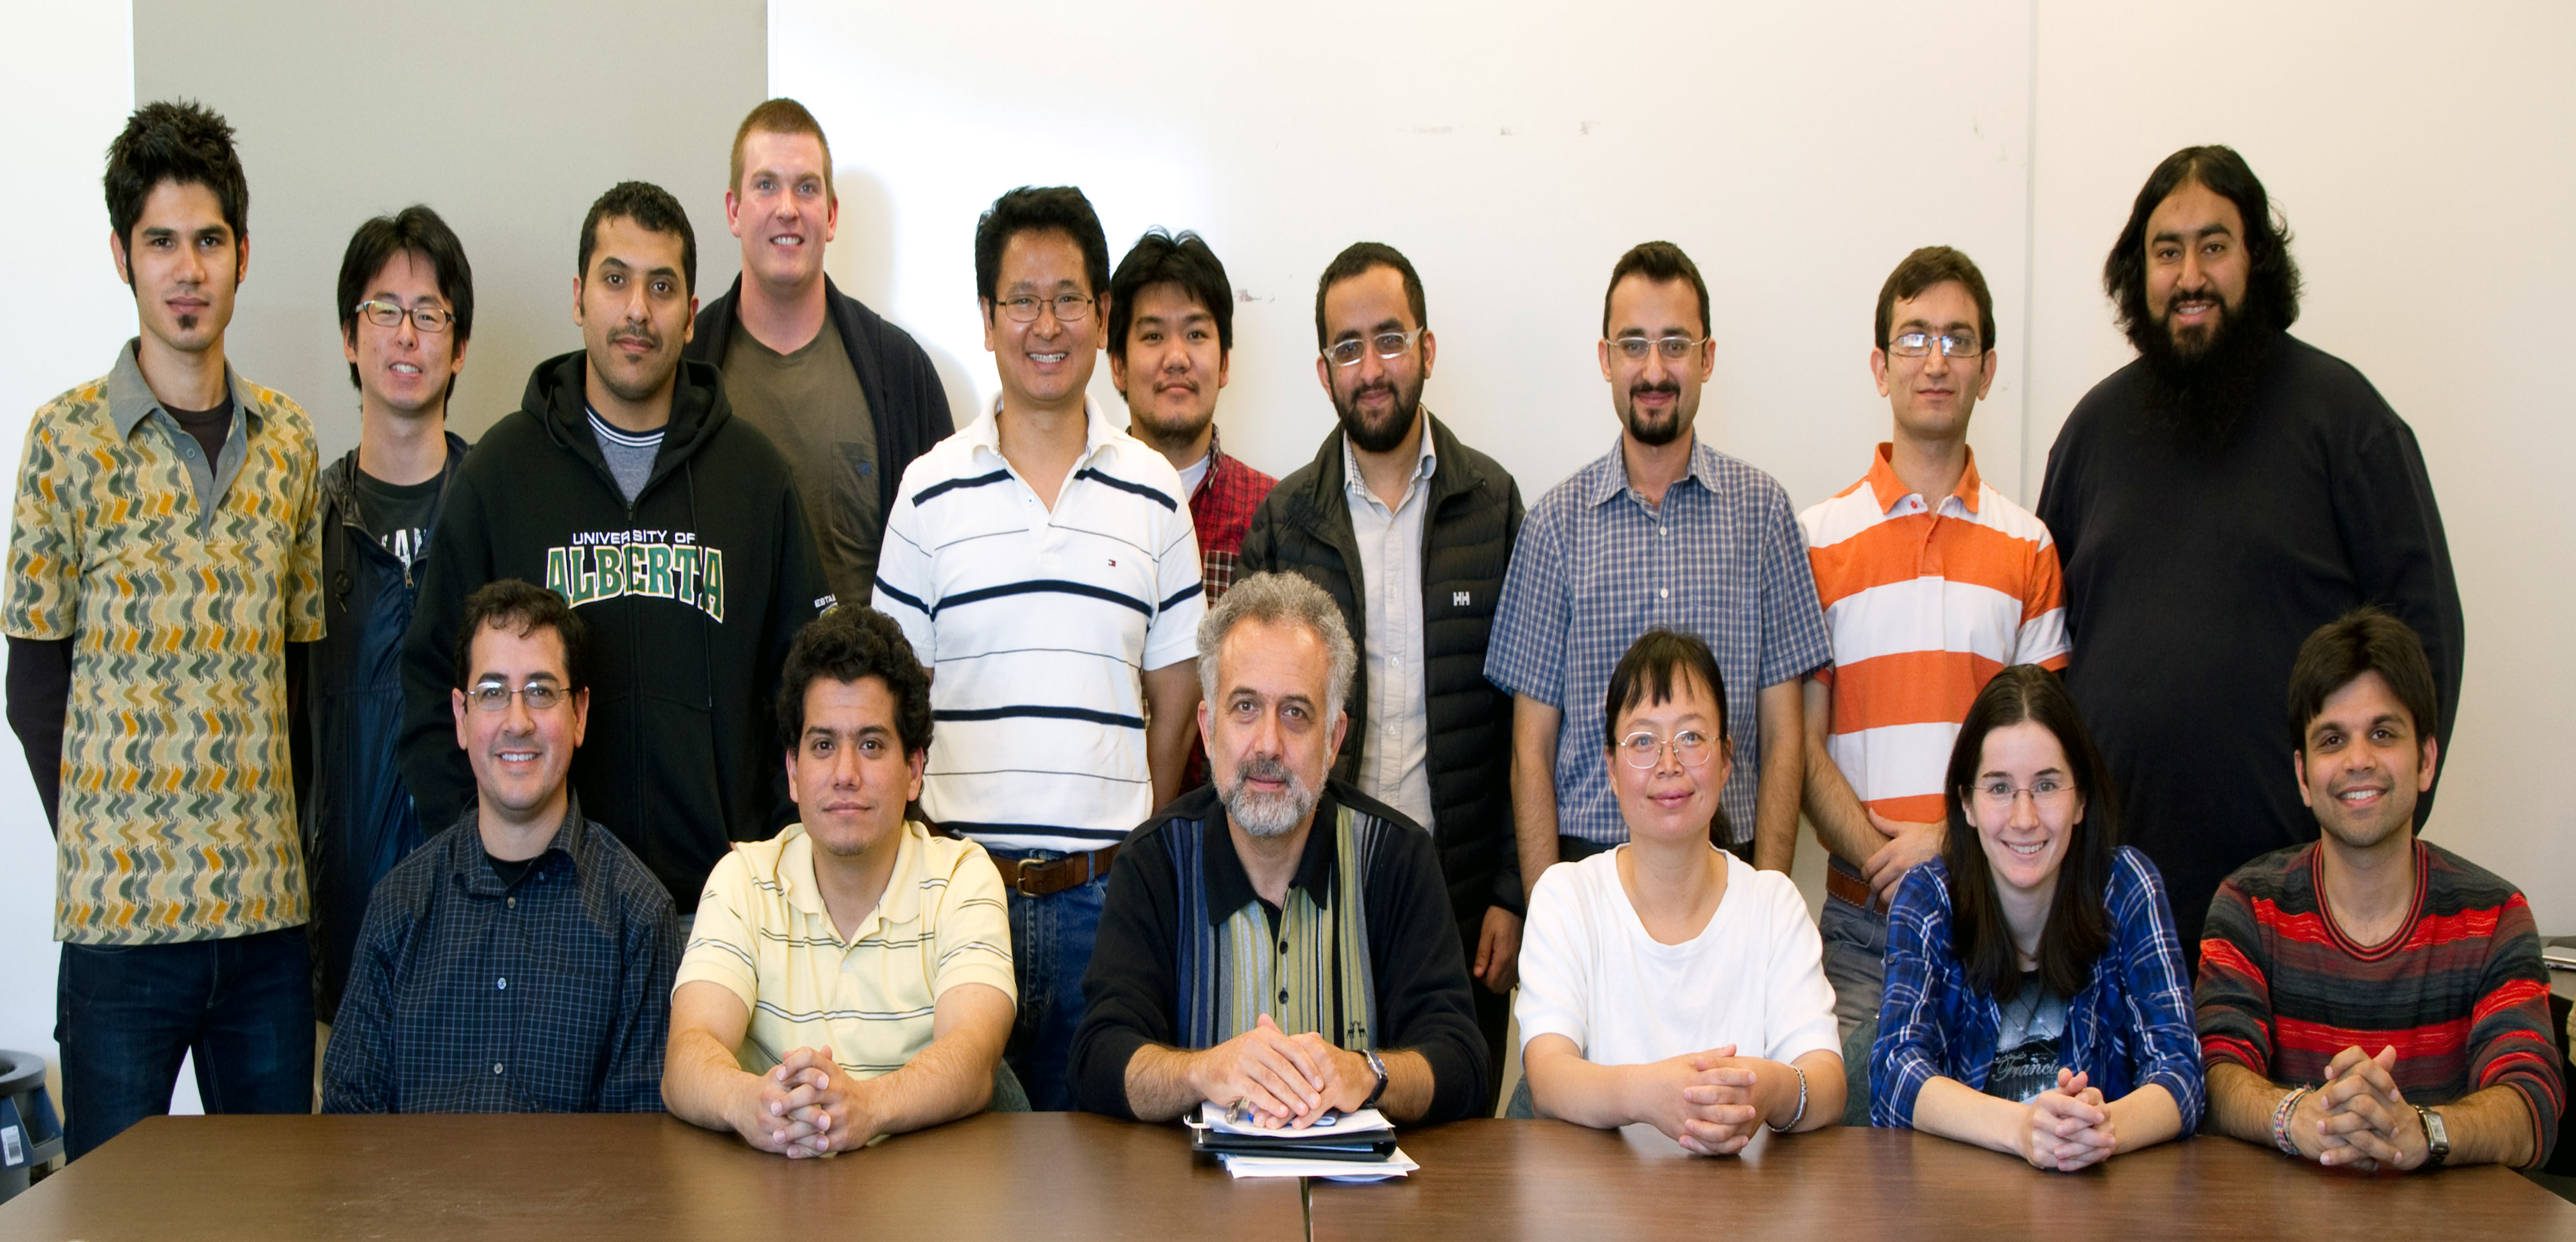 2010 EOGRRC Group